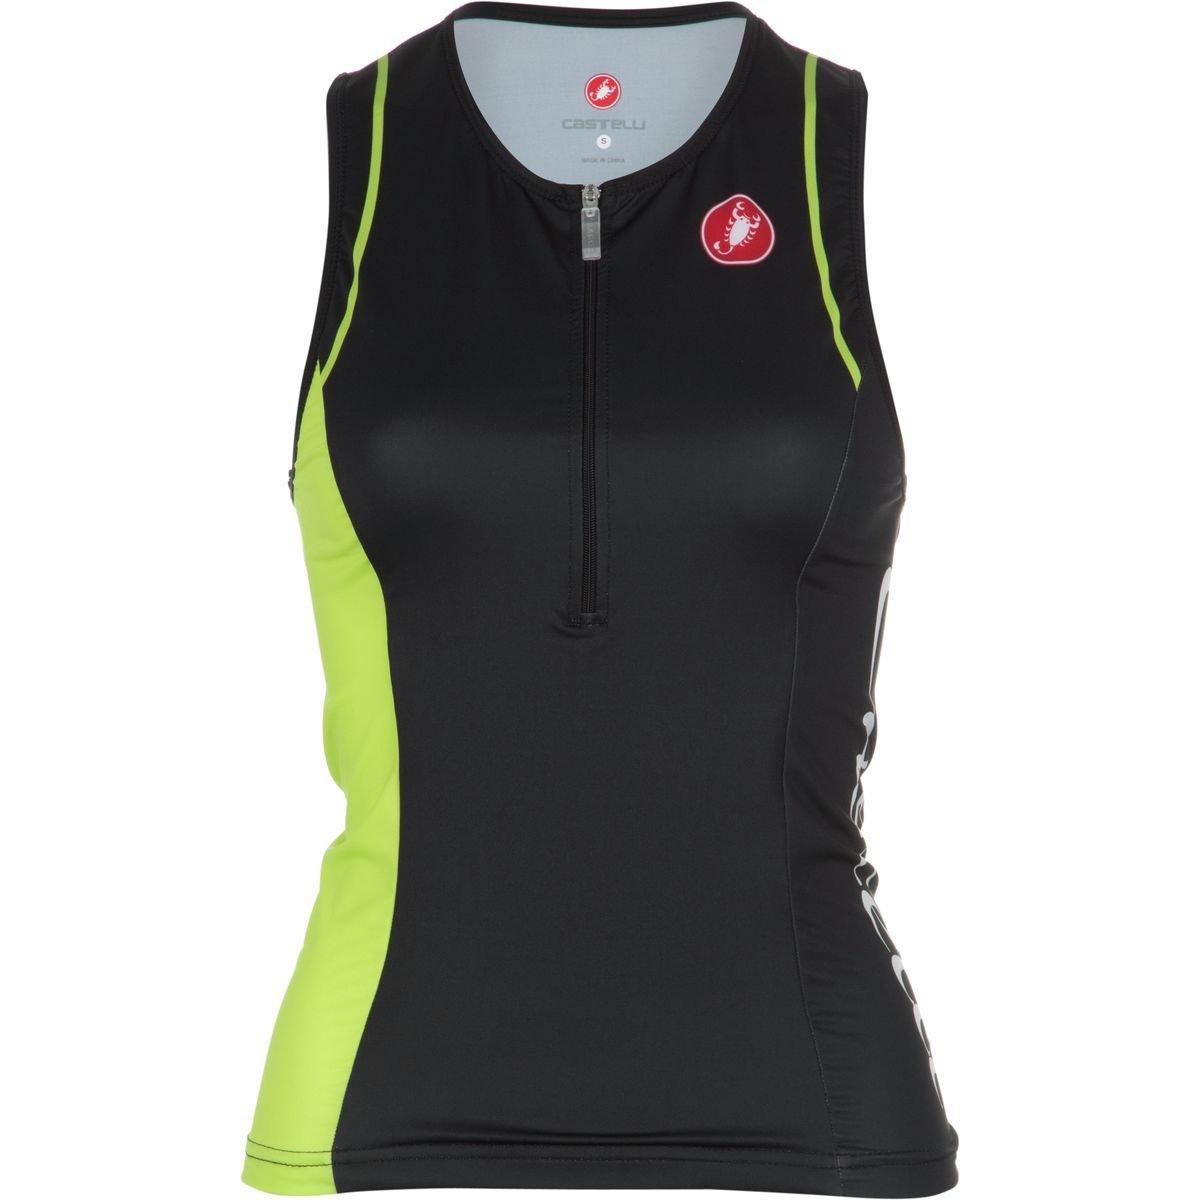 Castelli Core Tri Singlet - Women's Black/Lime, XL